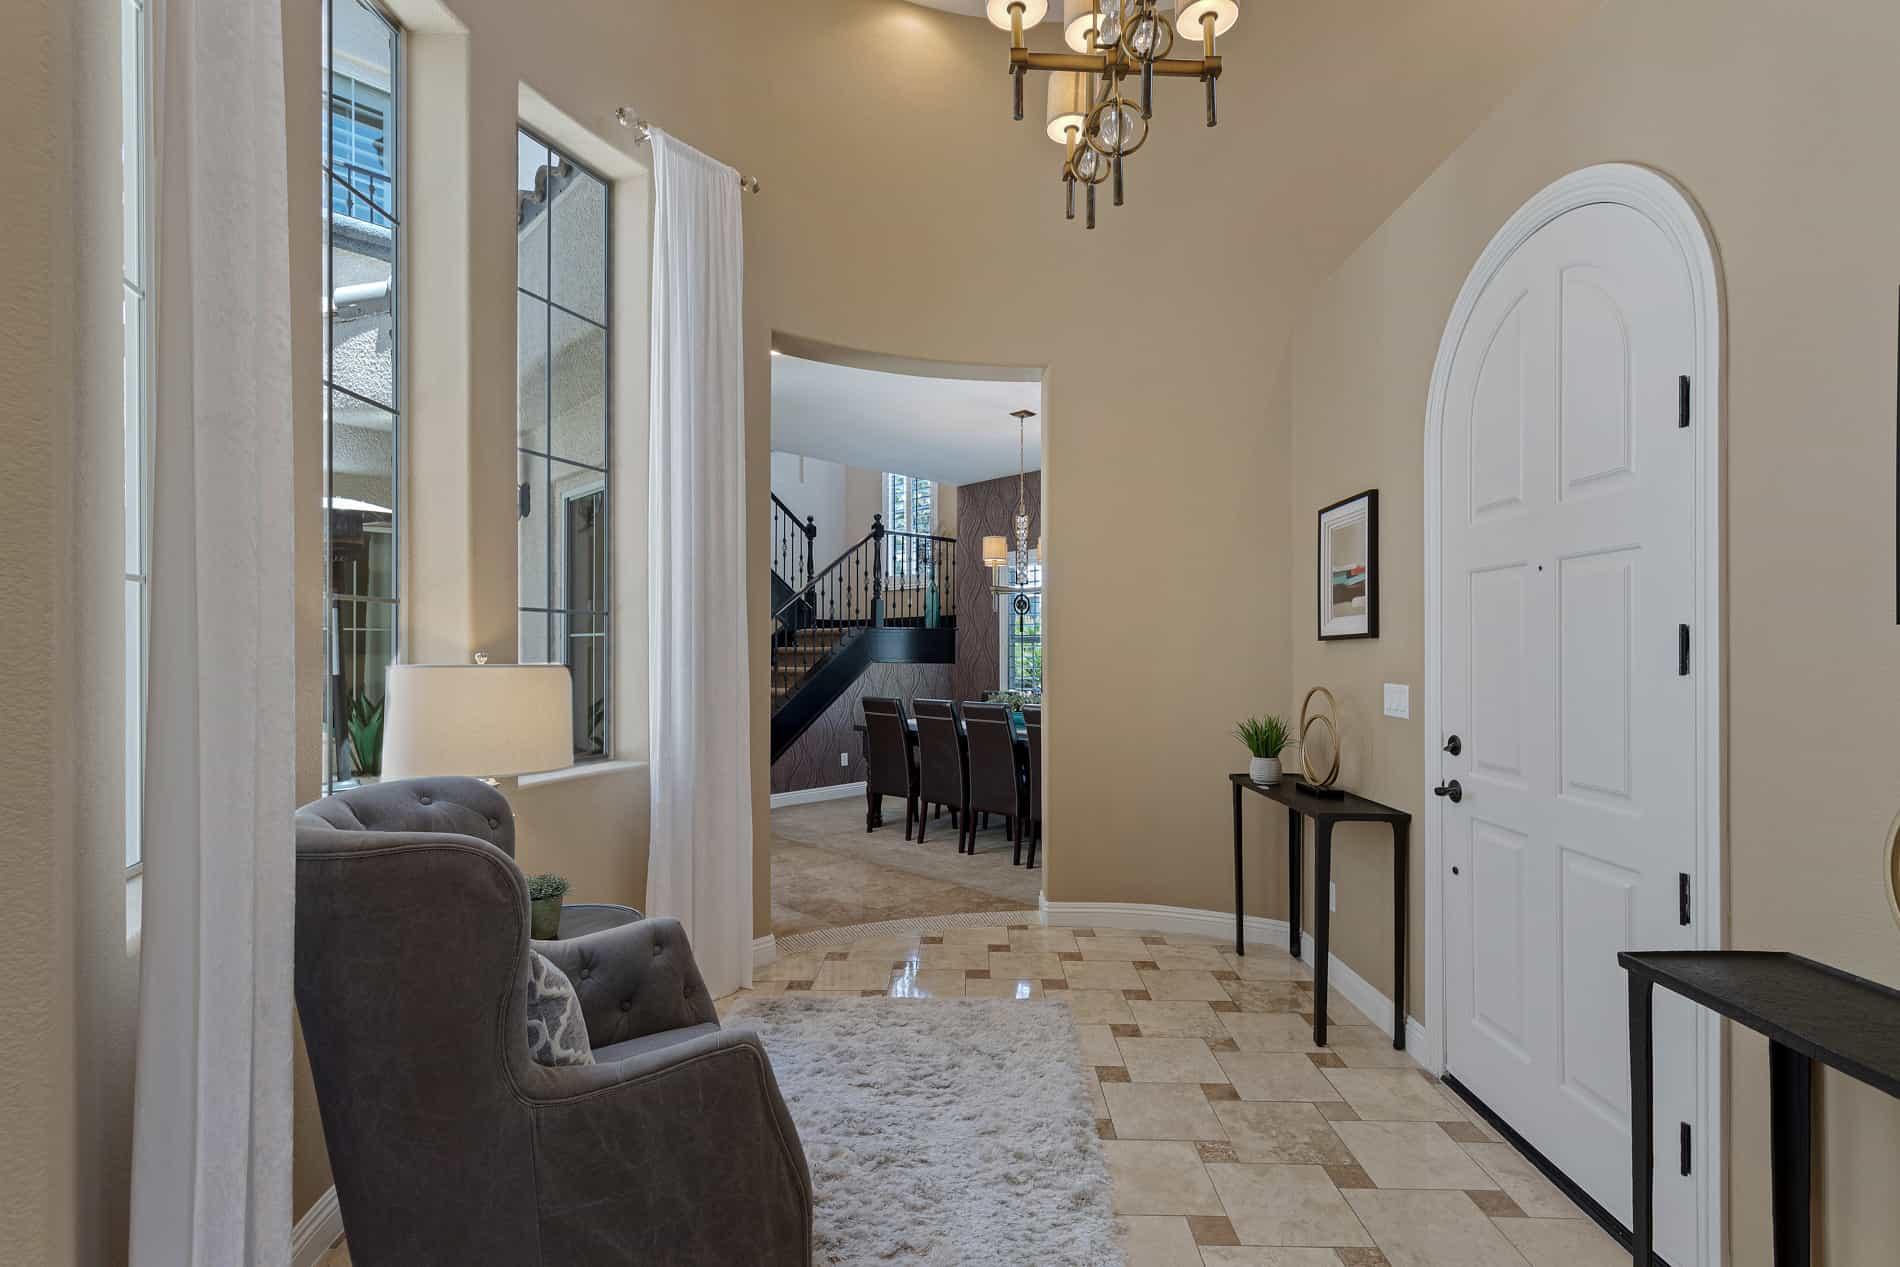 las-vegas-luxry-real-estate-realtor-rob-jensen-company-12108-vista-linda-avenue-the-paseos006